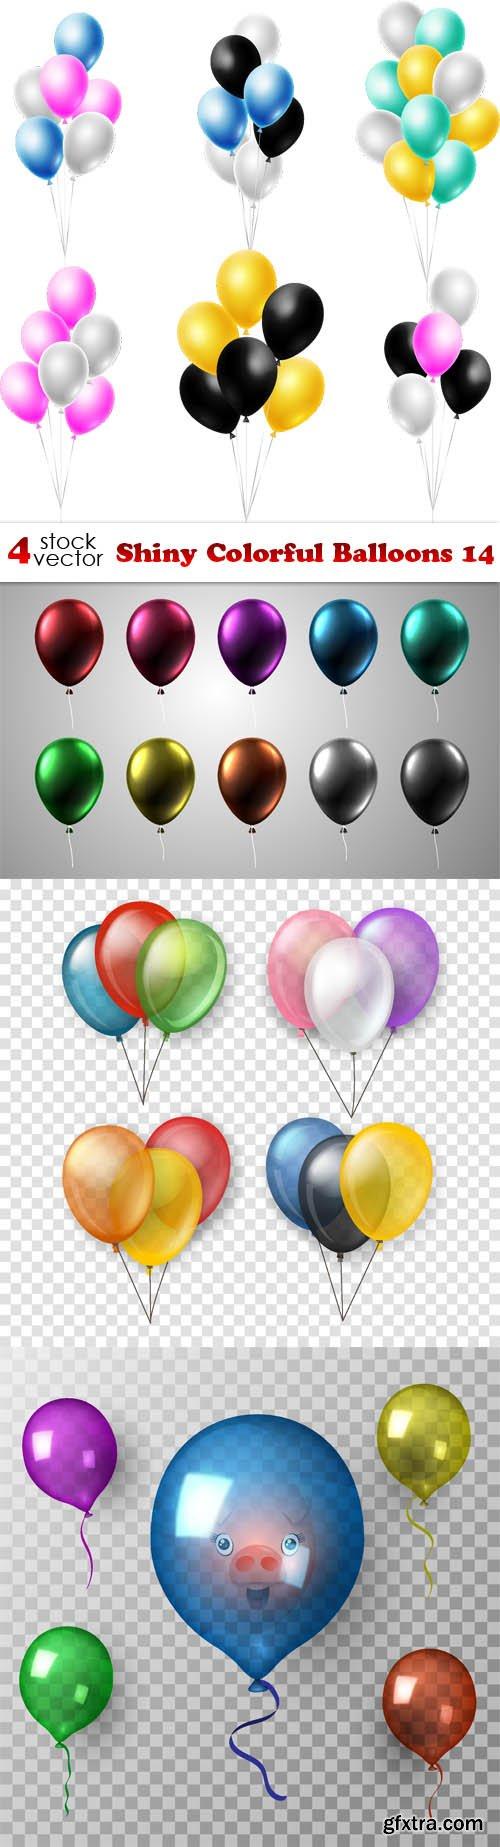 Vectors - Shiny Colorful Balloons 14